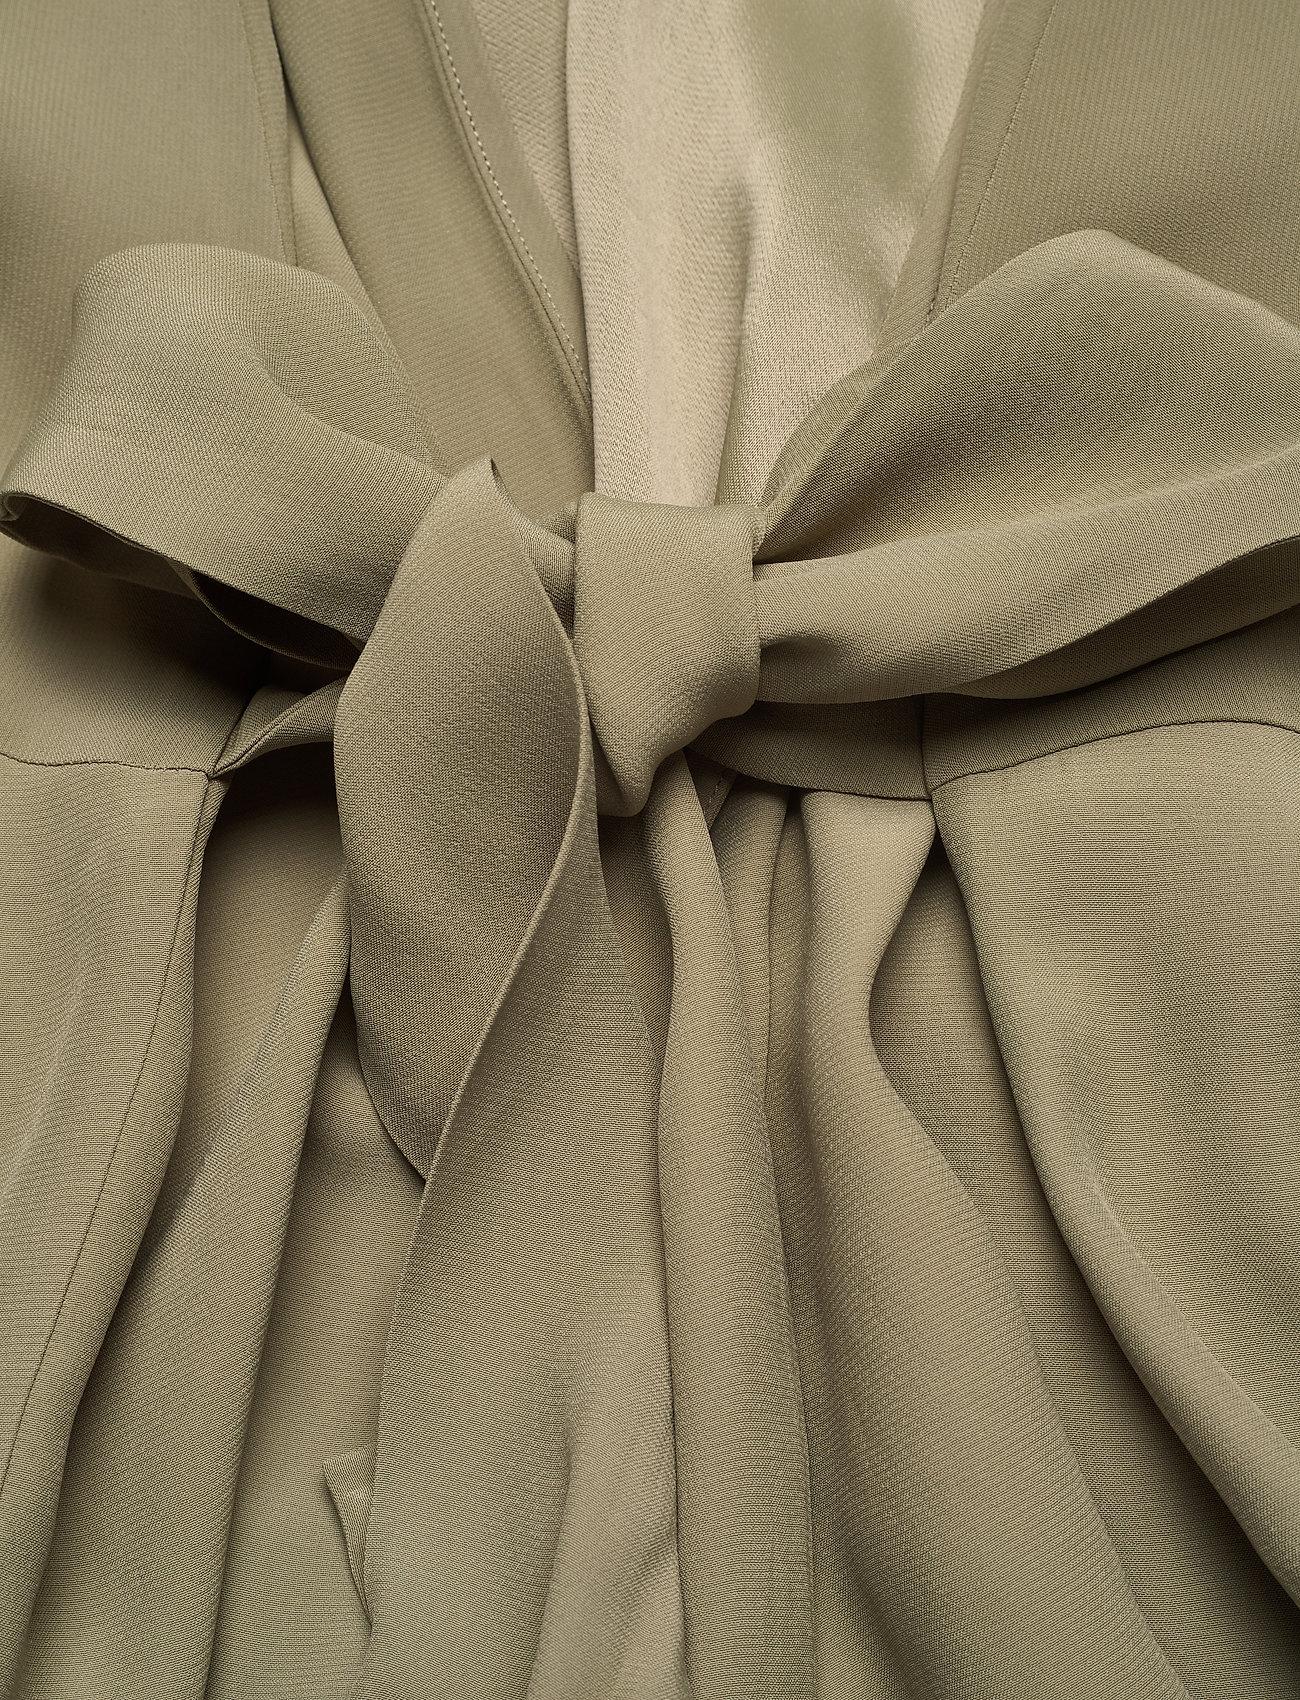 RODEBJER - RODEBJER TENNESSEE TWILL - kimonoer - olive leaf - 3